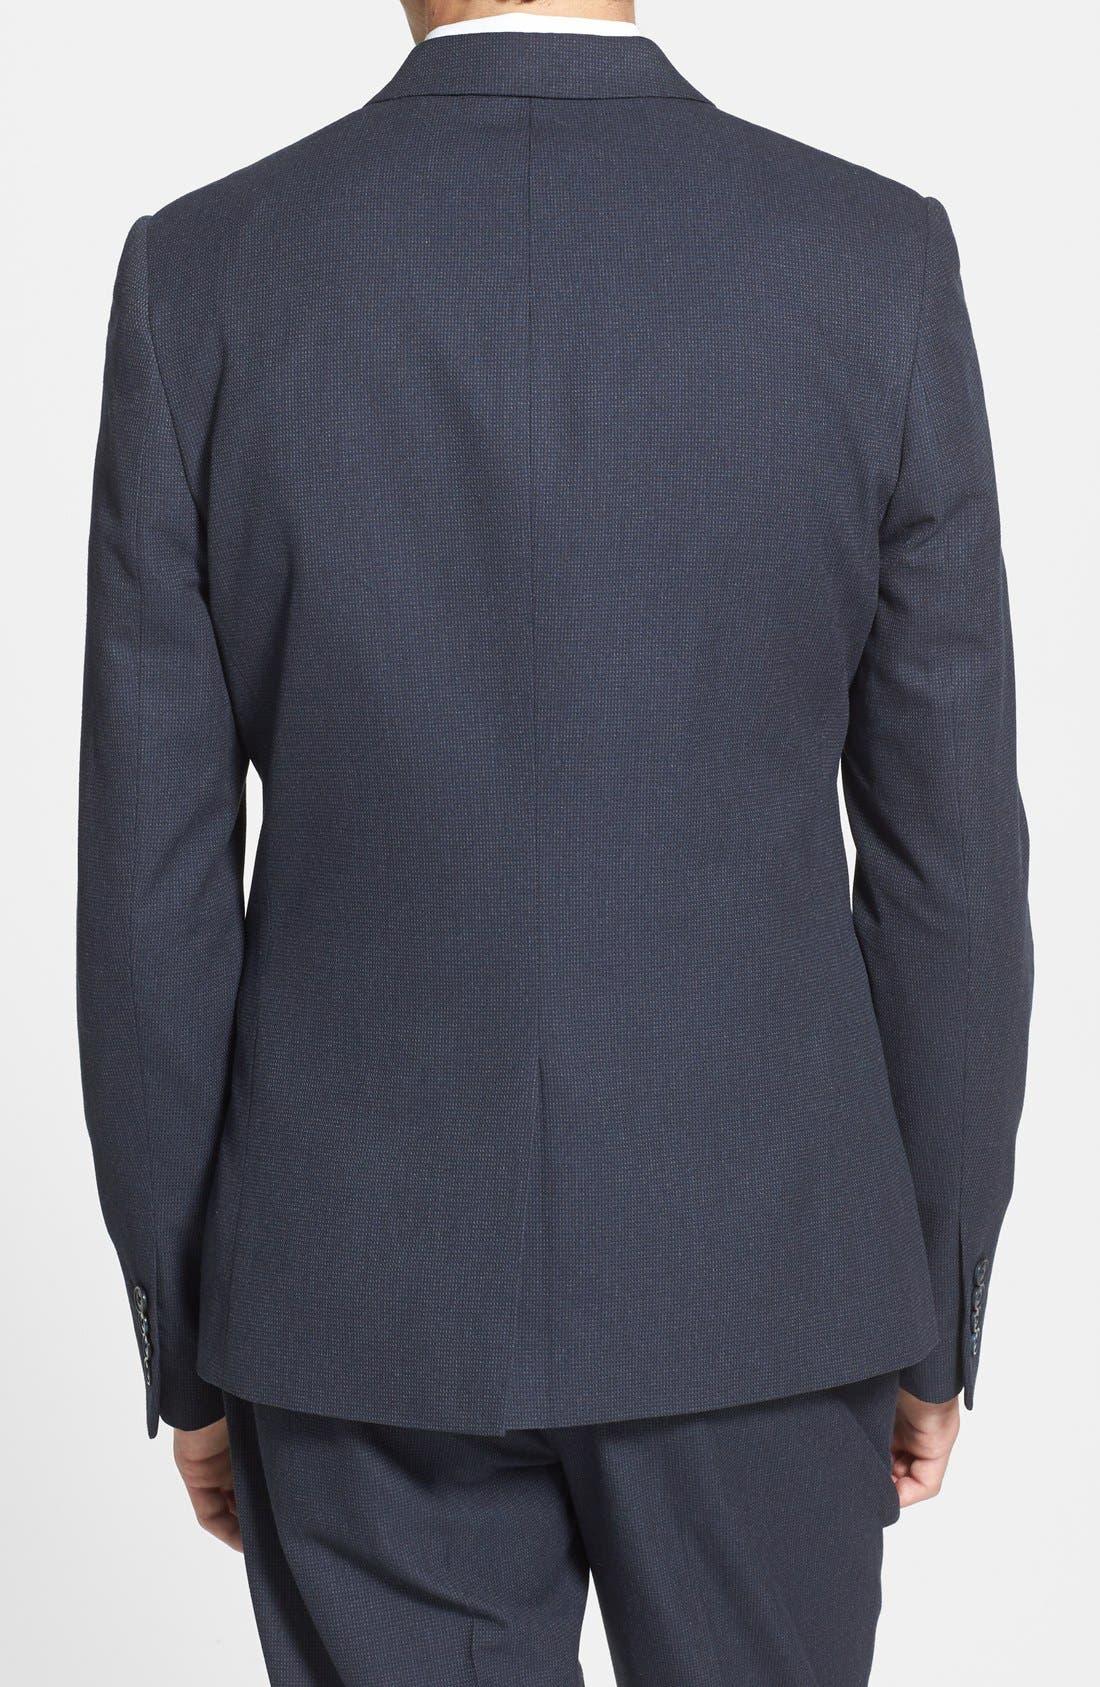 Alternate Image 2  - Topman Navy Pin Dot Skinny Fit Suit Jacket